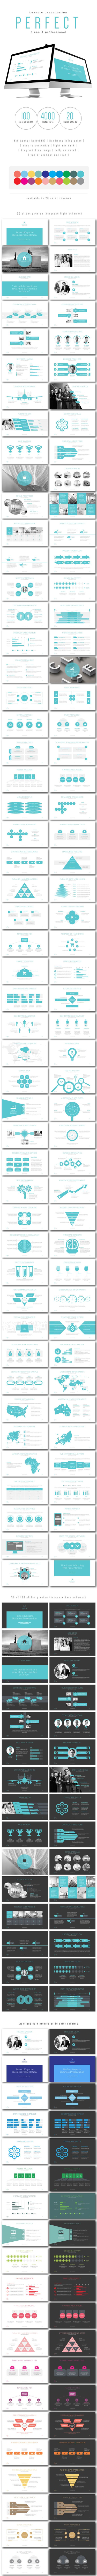 Multipurpose Keynote Presentation Template | #keynote #keynotetemplate | Download: http://graphicriver.net/item/multipurpose-keynote-presentation-vol-09/9087764?ref=ksioks